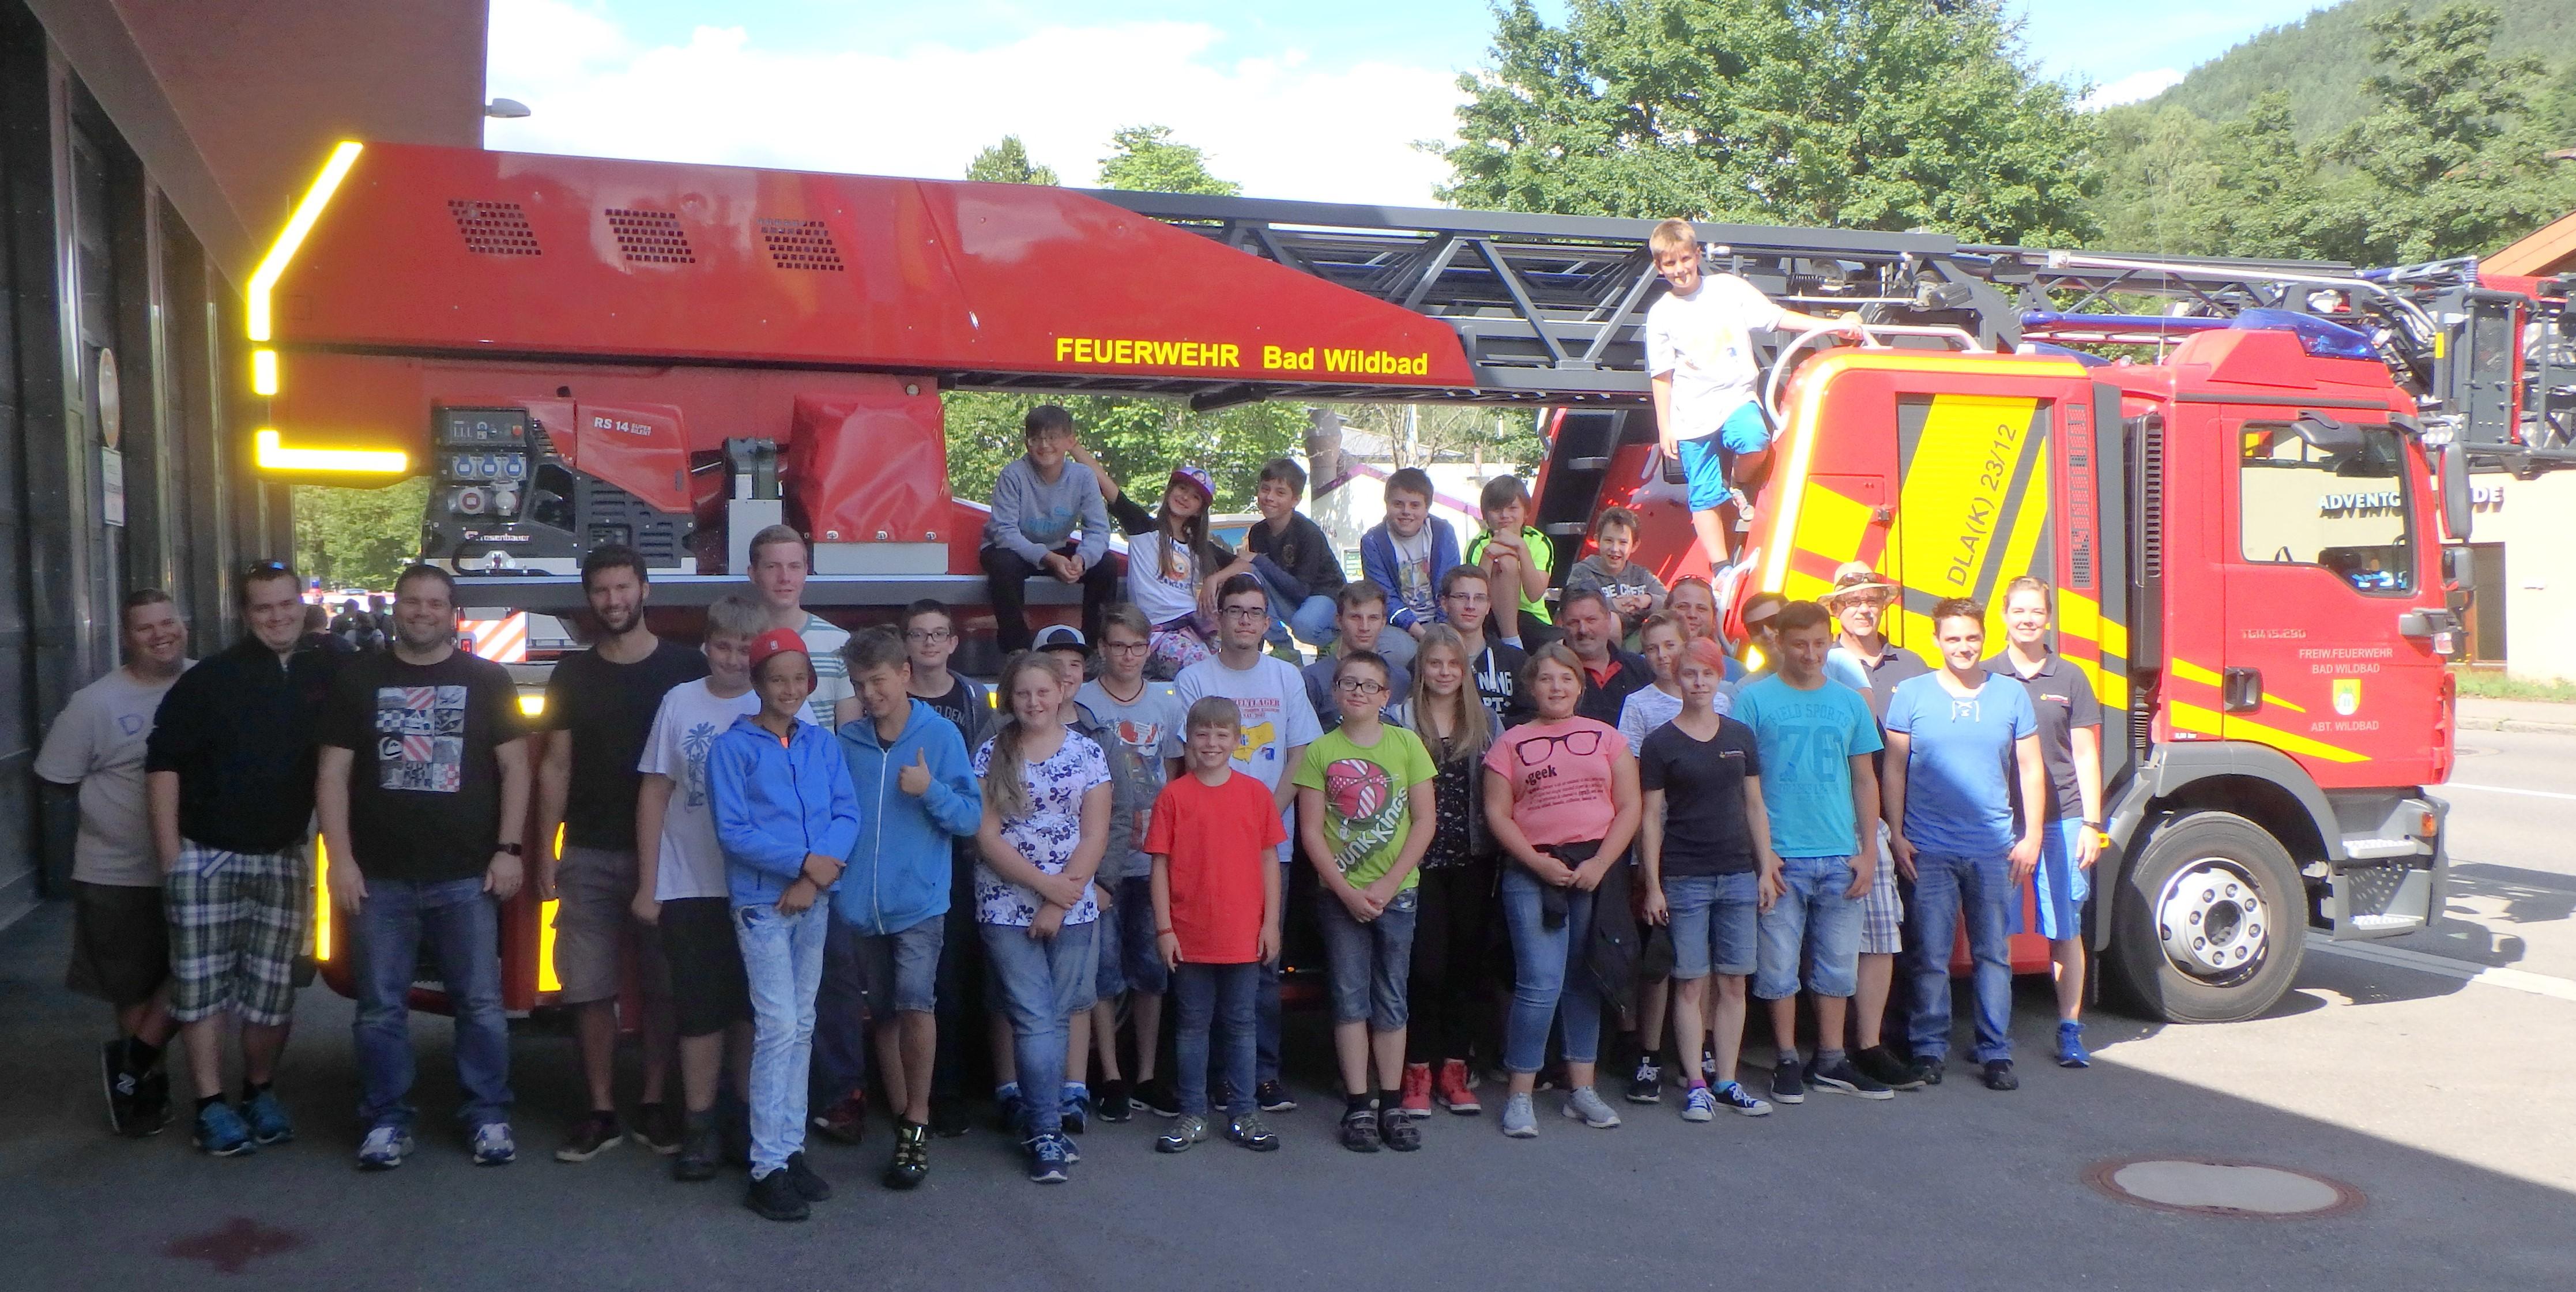 Gesamtjugendfeuerwehr Ettlingen on tour